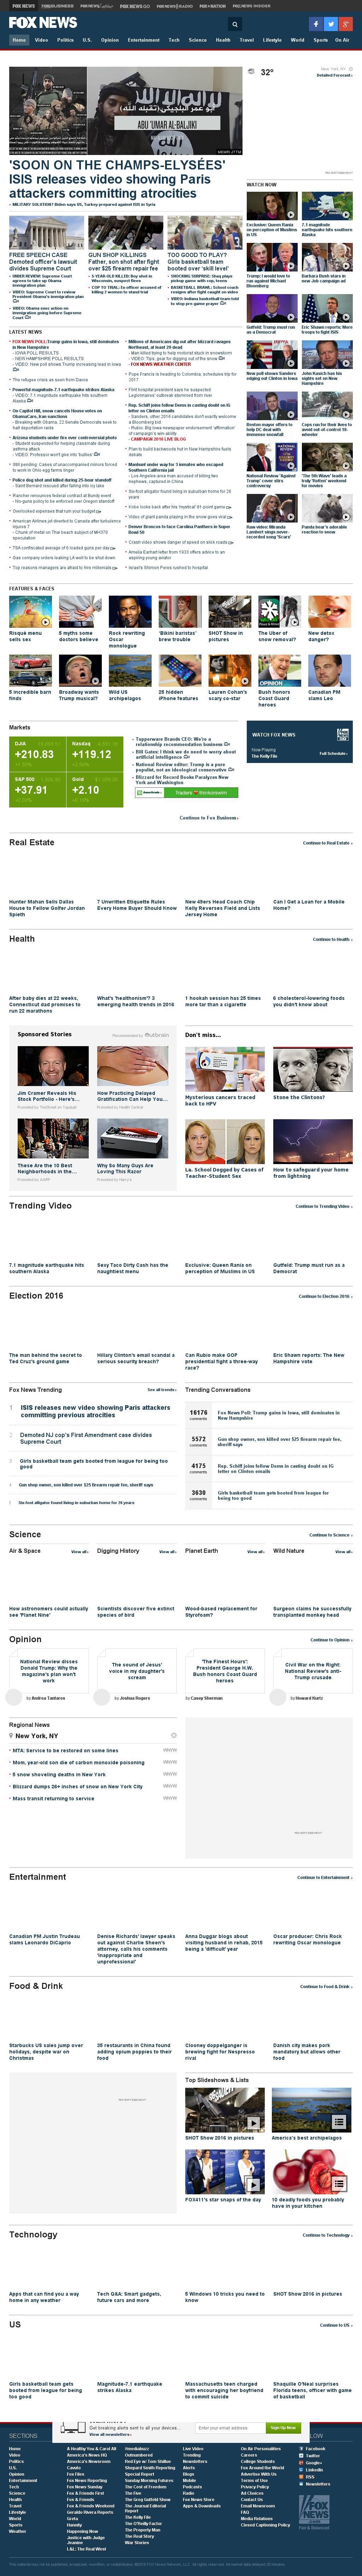 Fox News at Monday Jan. 25, 2016, 4:06 a.m. UTC